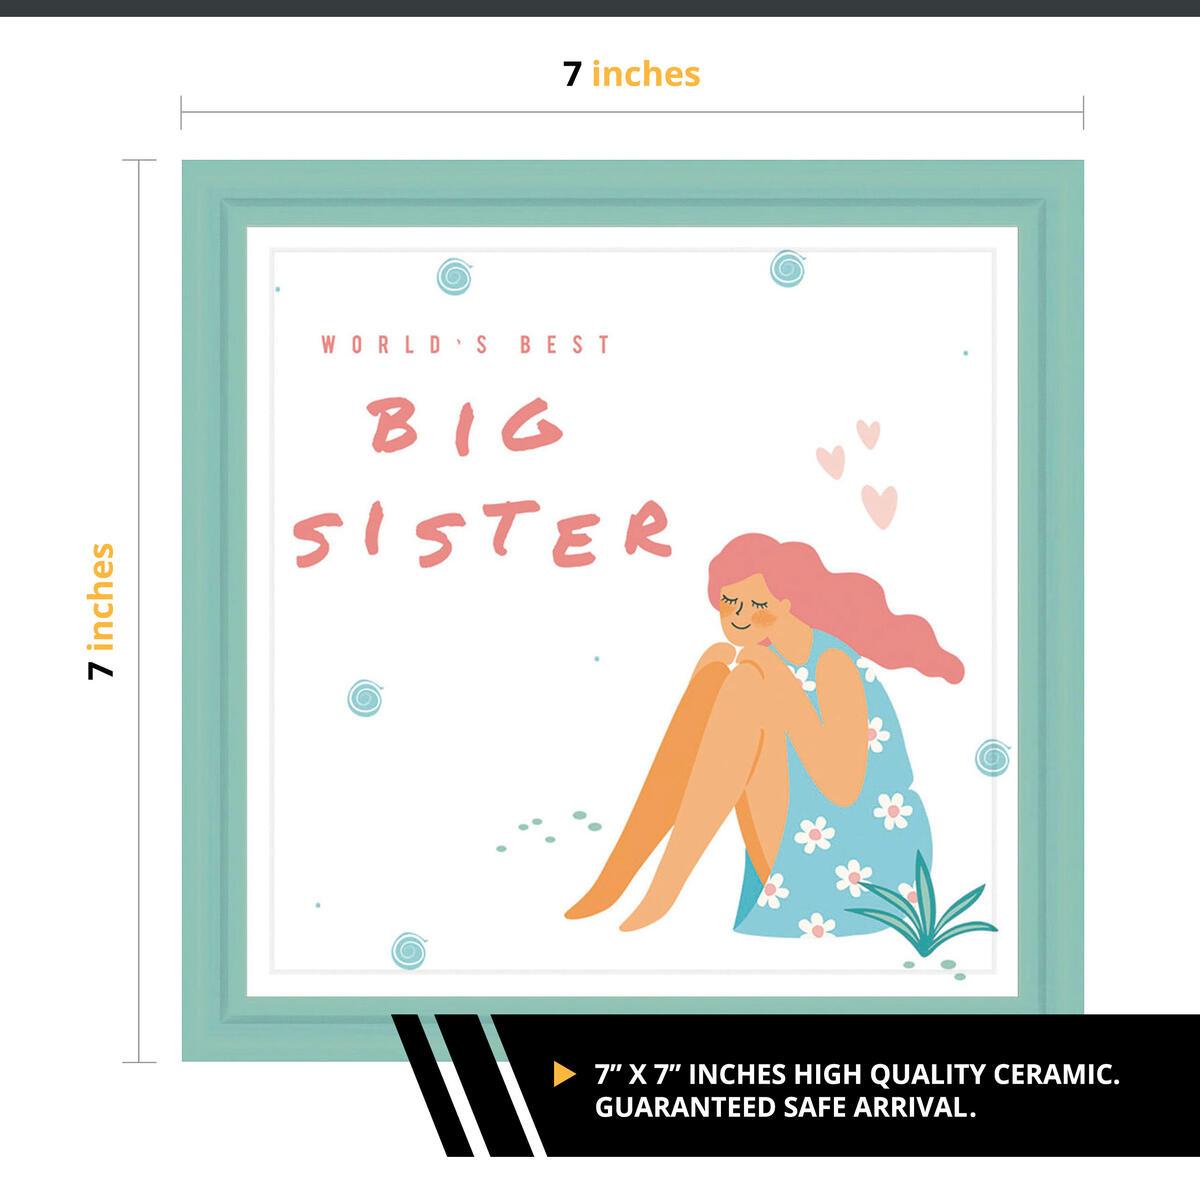 Big Sister Gifts | 7x7